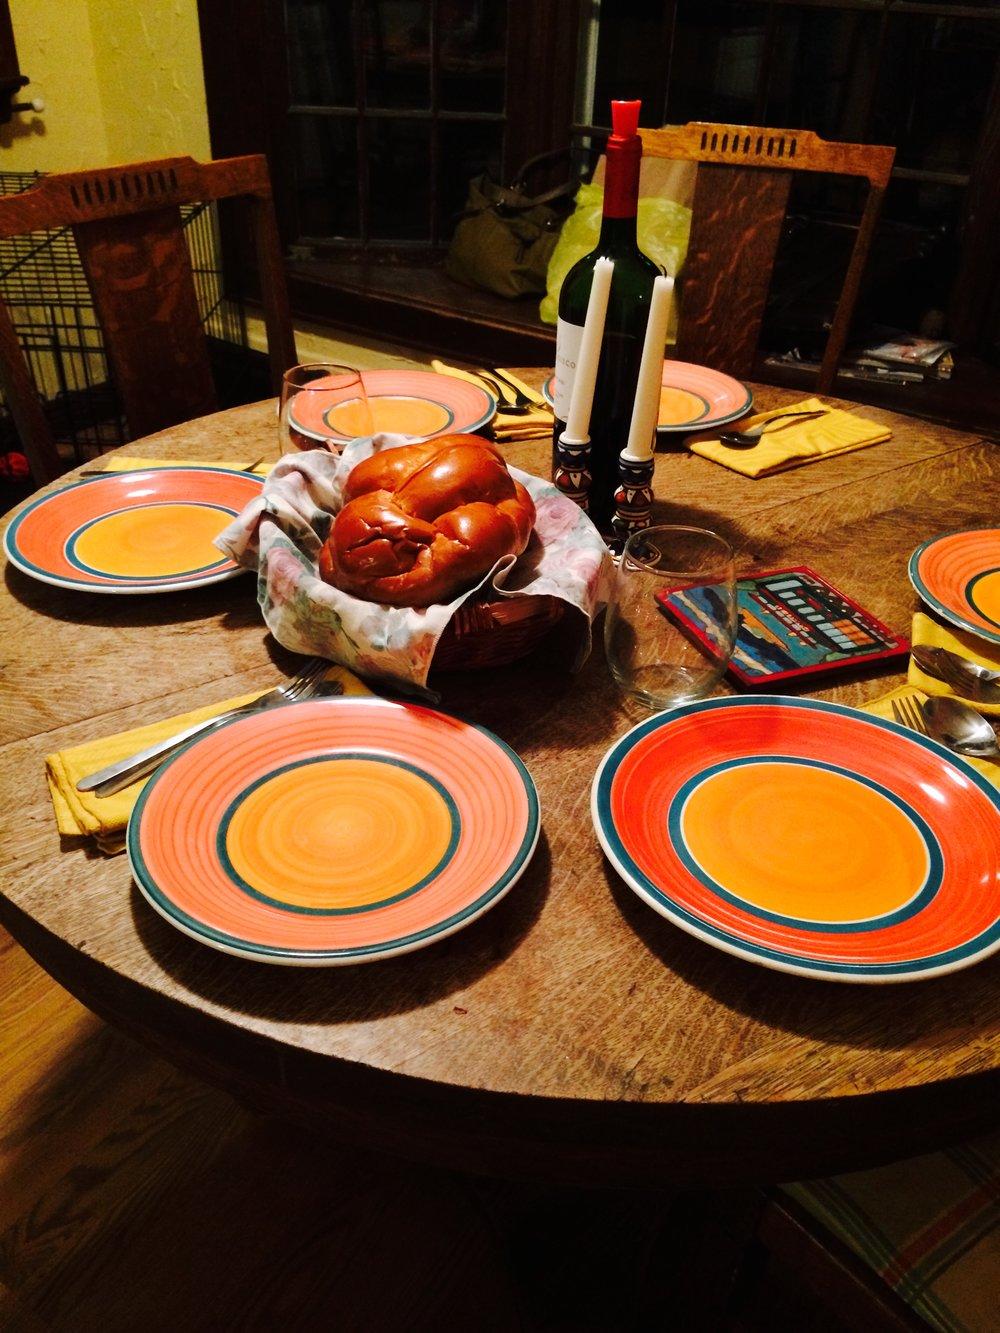 My childhood kitchen table, set up for  Shabbat Dinner .